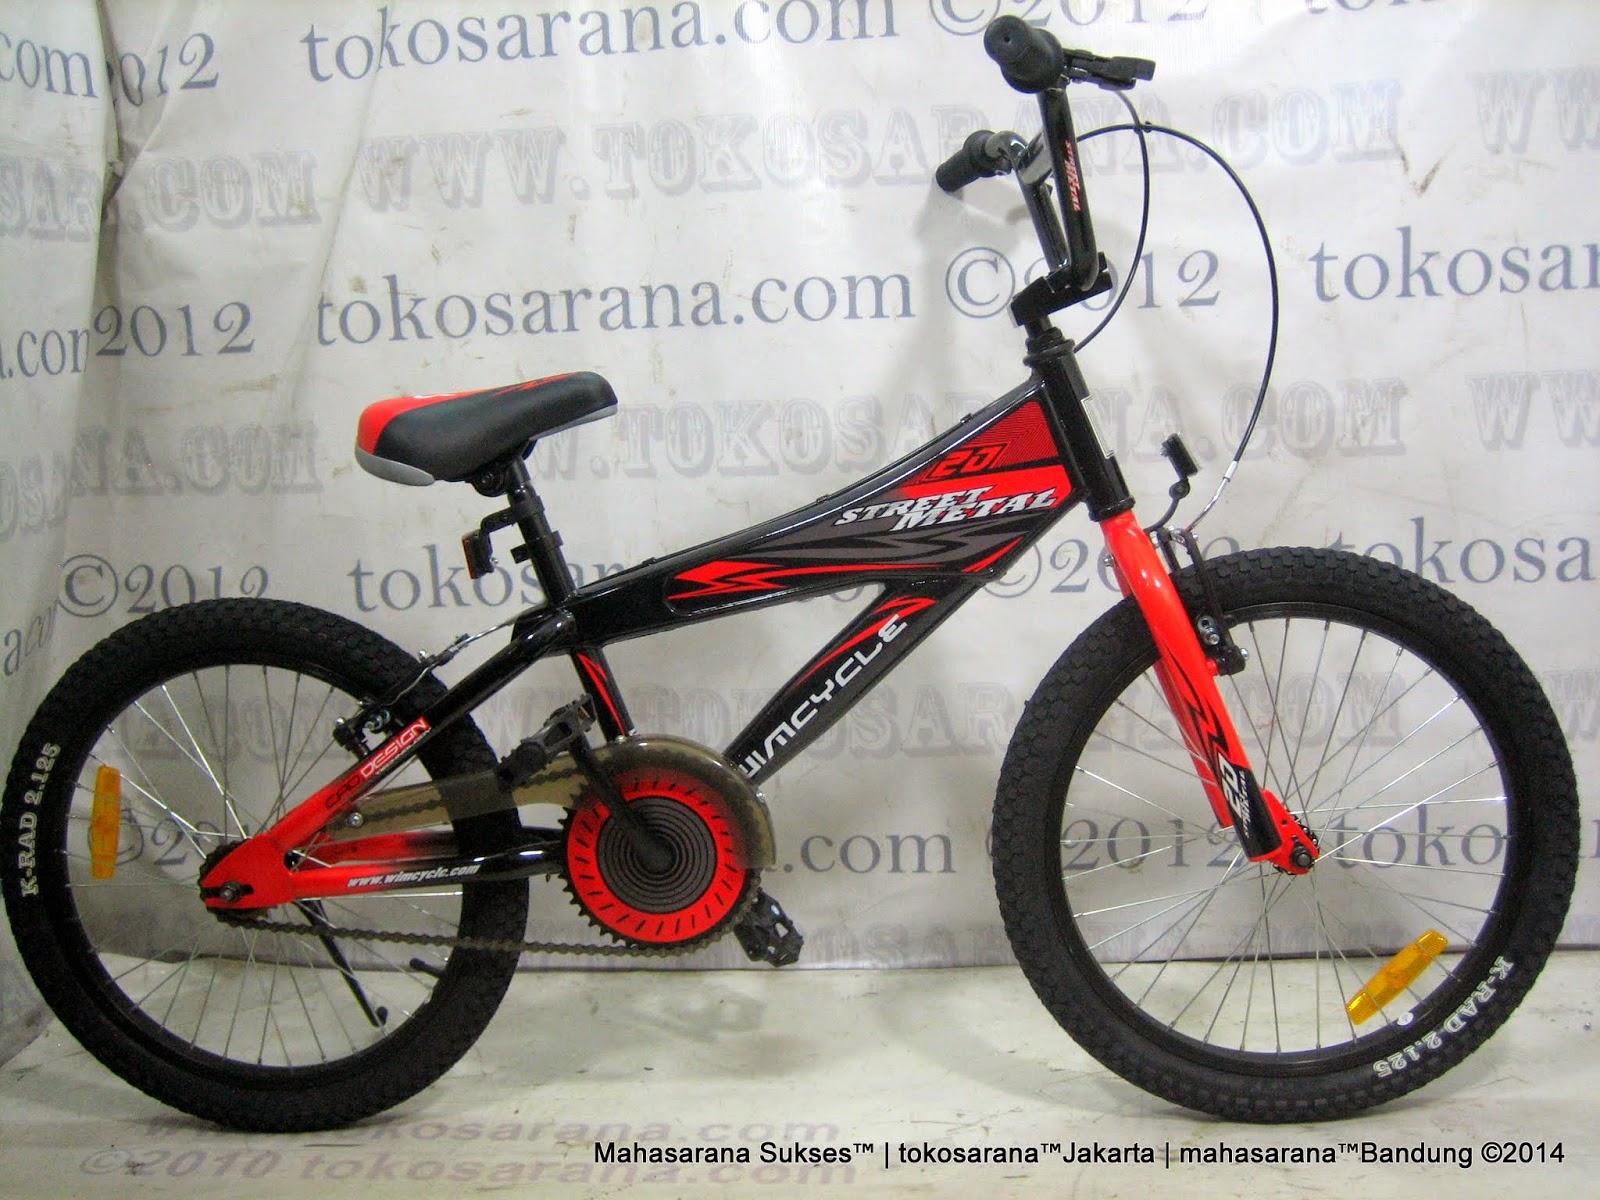 Tokosarana Mahasarana Sukses Sepeda Bmx Wimcycle Street Metal 20 Inci